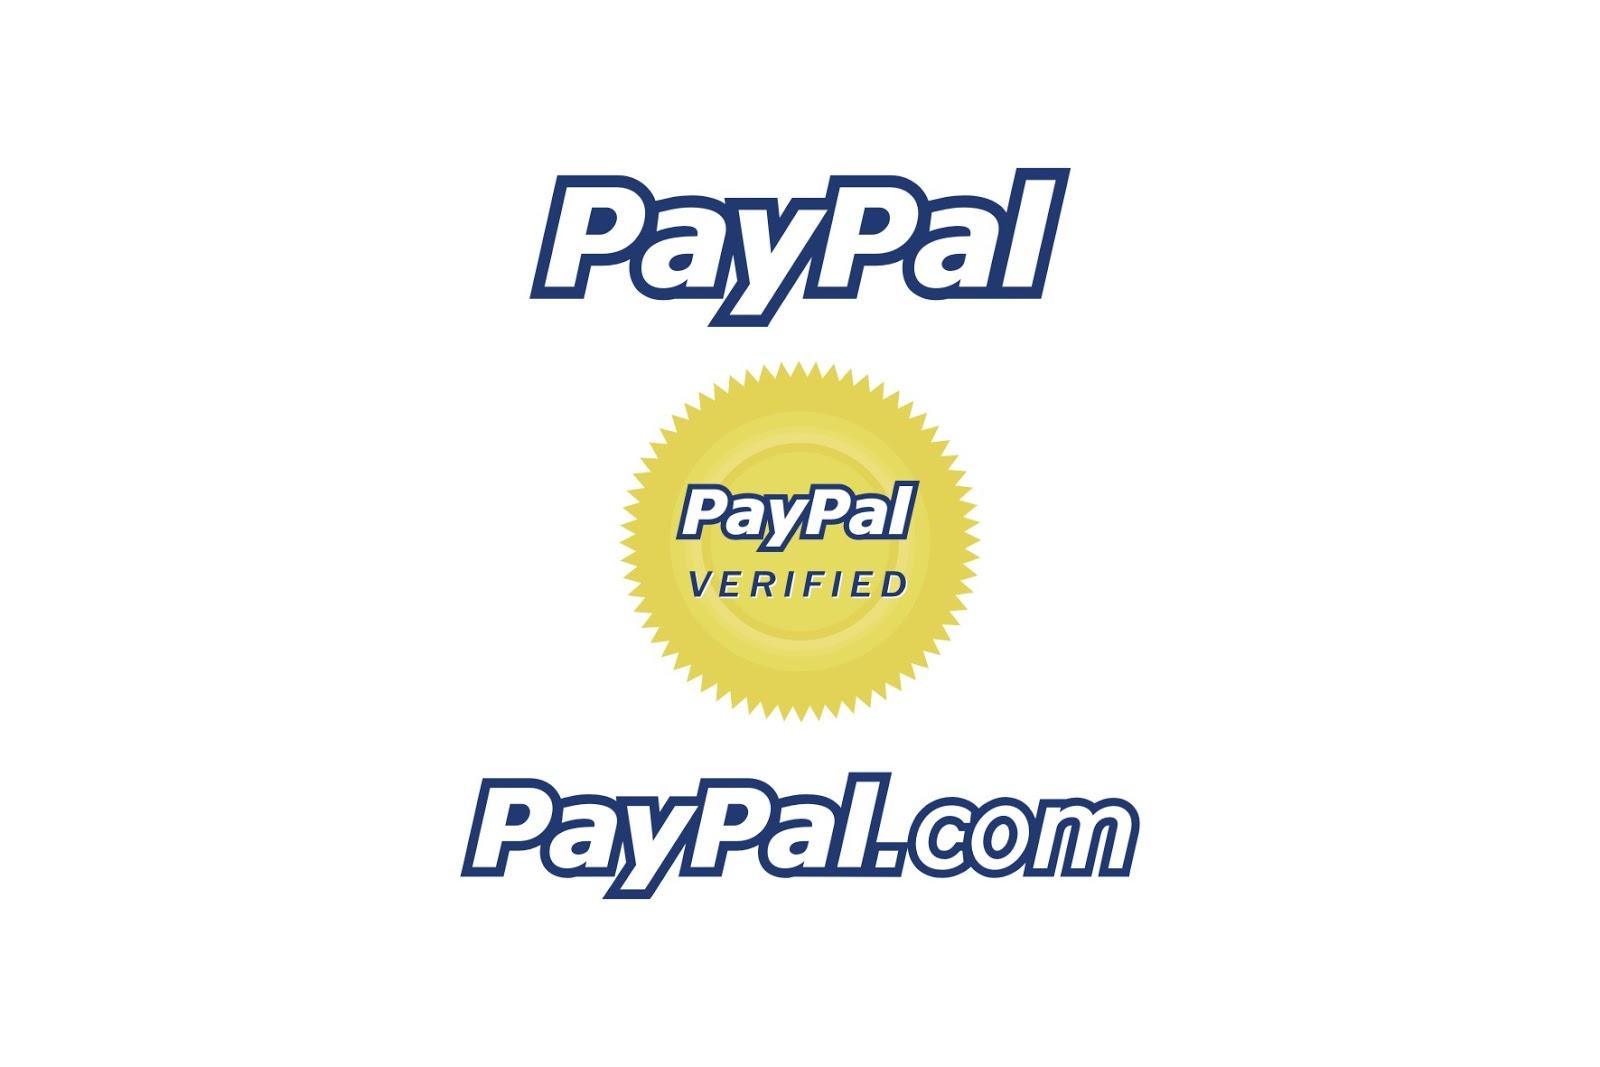 paypal verified logo logoshare